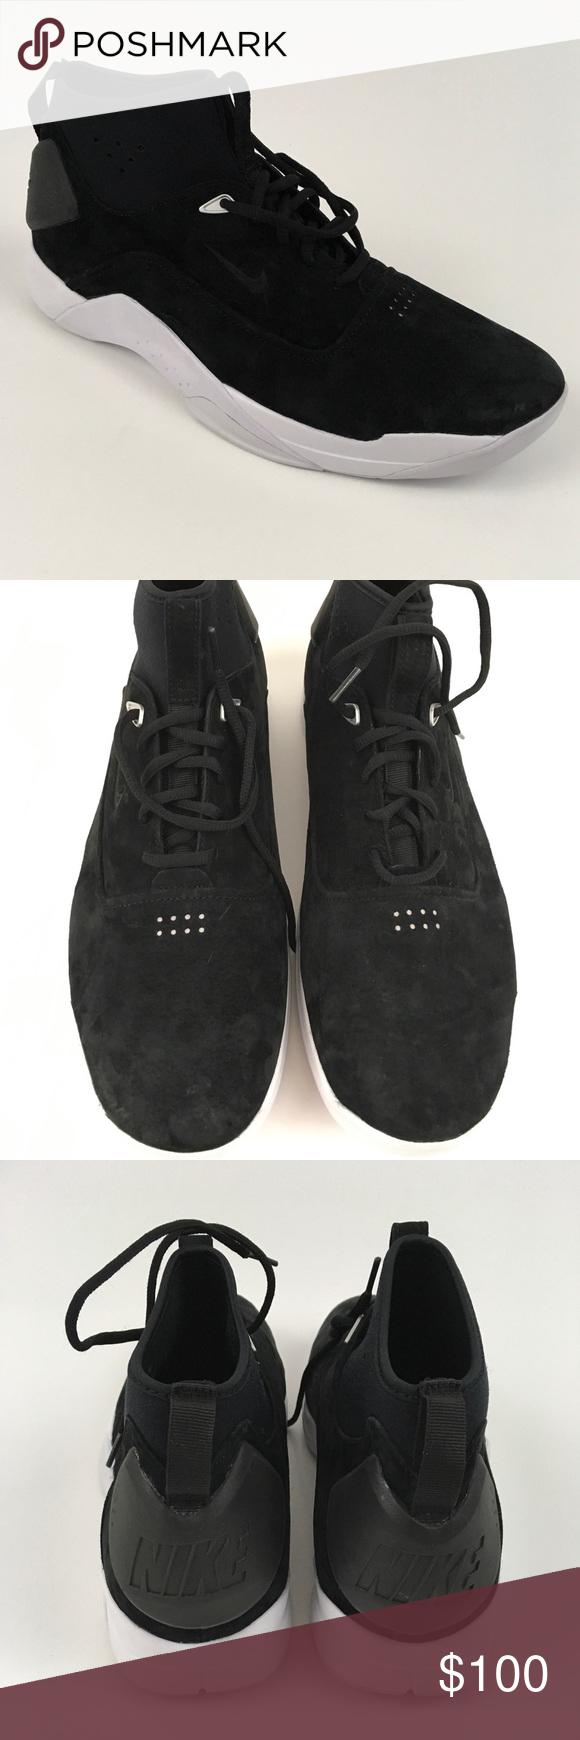 c10c82852db NWOT Nike Men s Hyperdunk Low Lux Basketball shoes NWOT Nike men s  hyperdunk low lux basketball shoes size 15. No box Nike Shoes Athletic Shoes